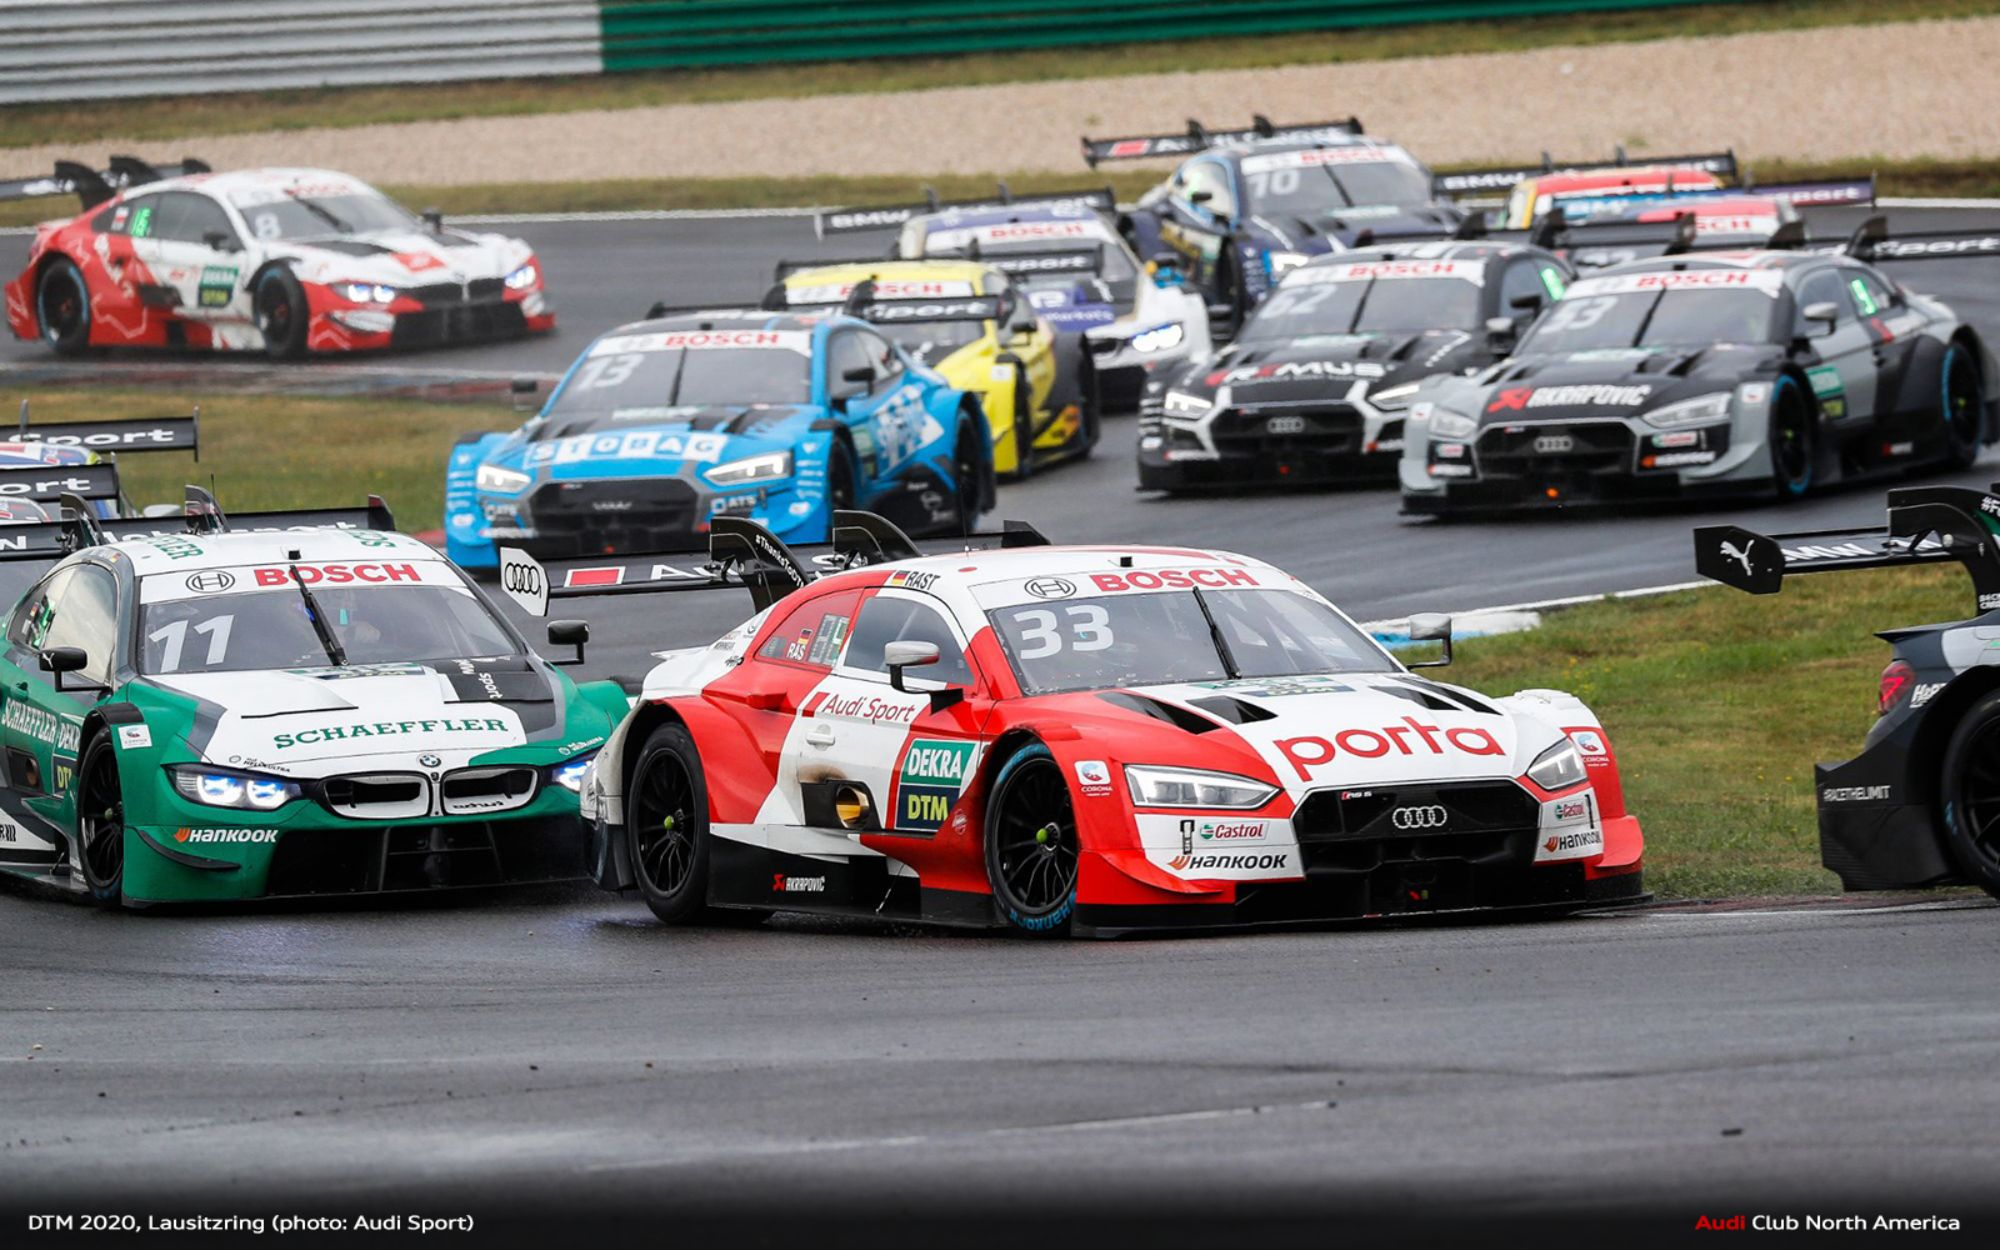 René Rast Wins in Audi Podium Sweep at Lausitzring